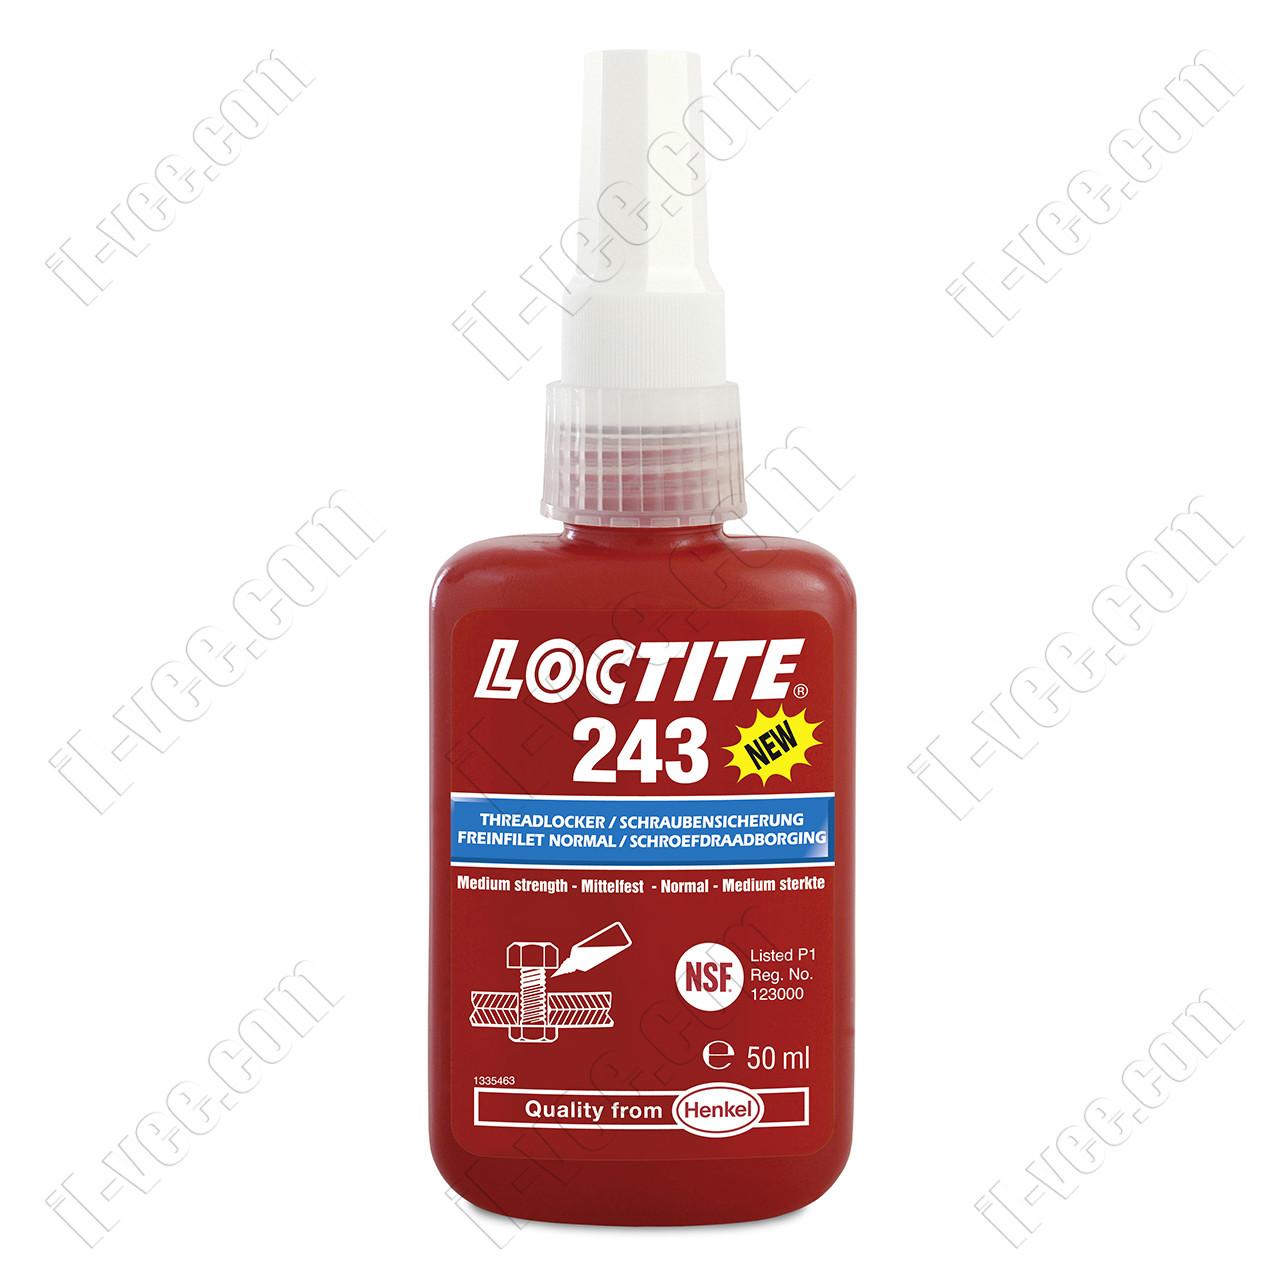 Резьбовой фиксатор Loctite 243, 50мл.